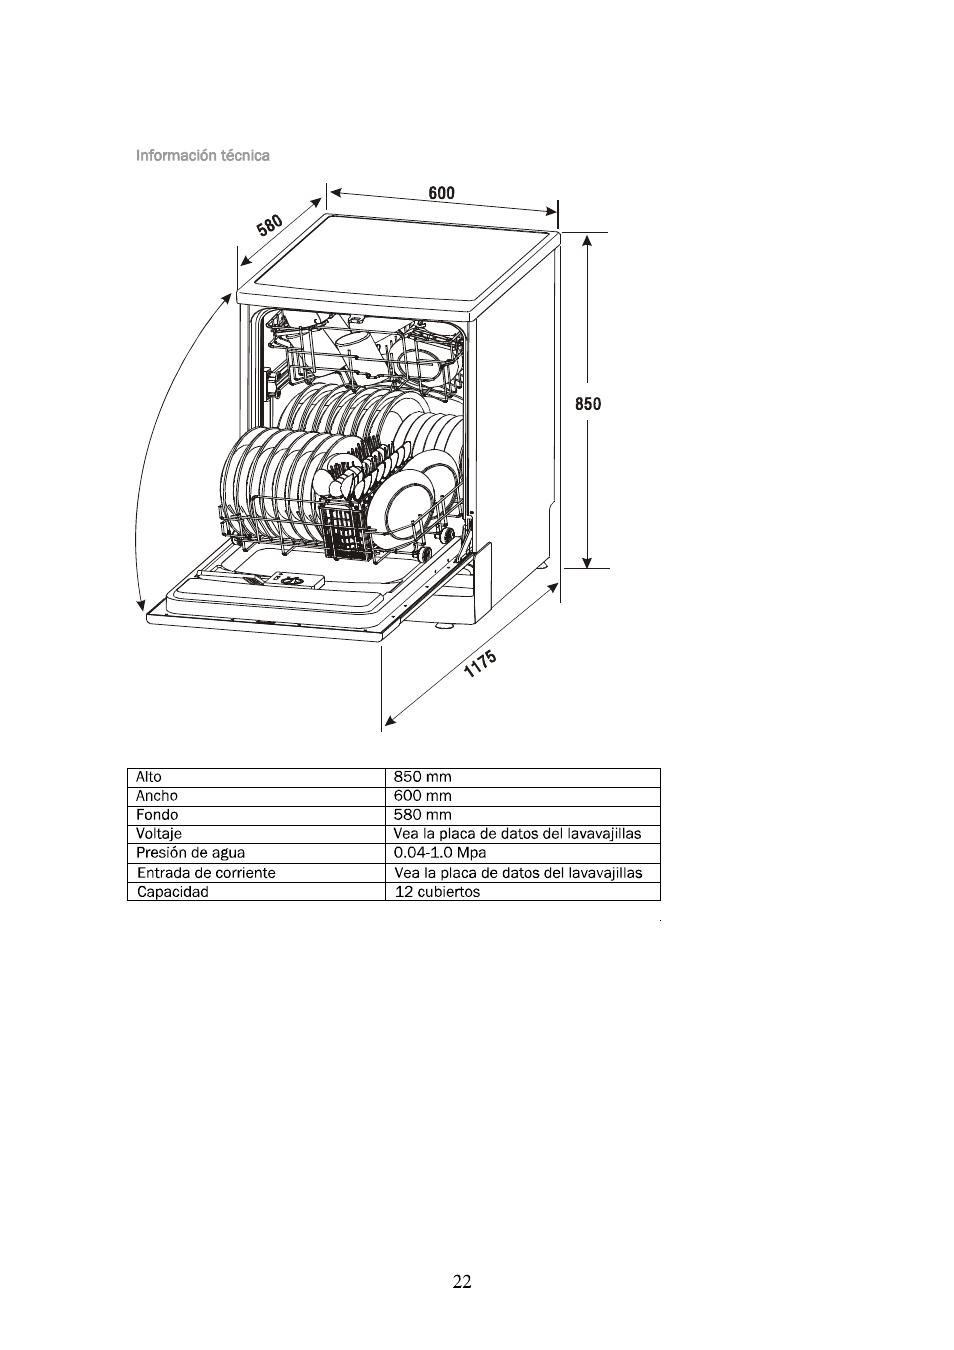 Manual instrucciones lavavajillas teka lv 831 by inhumturnga issuu.